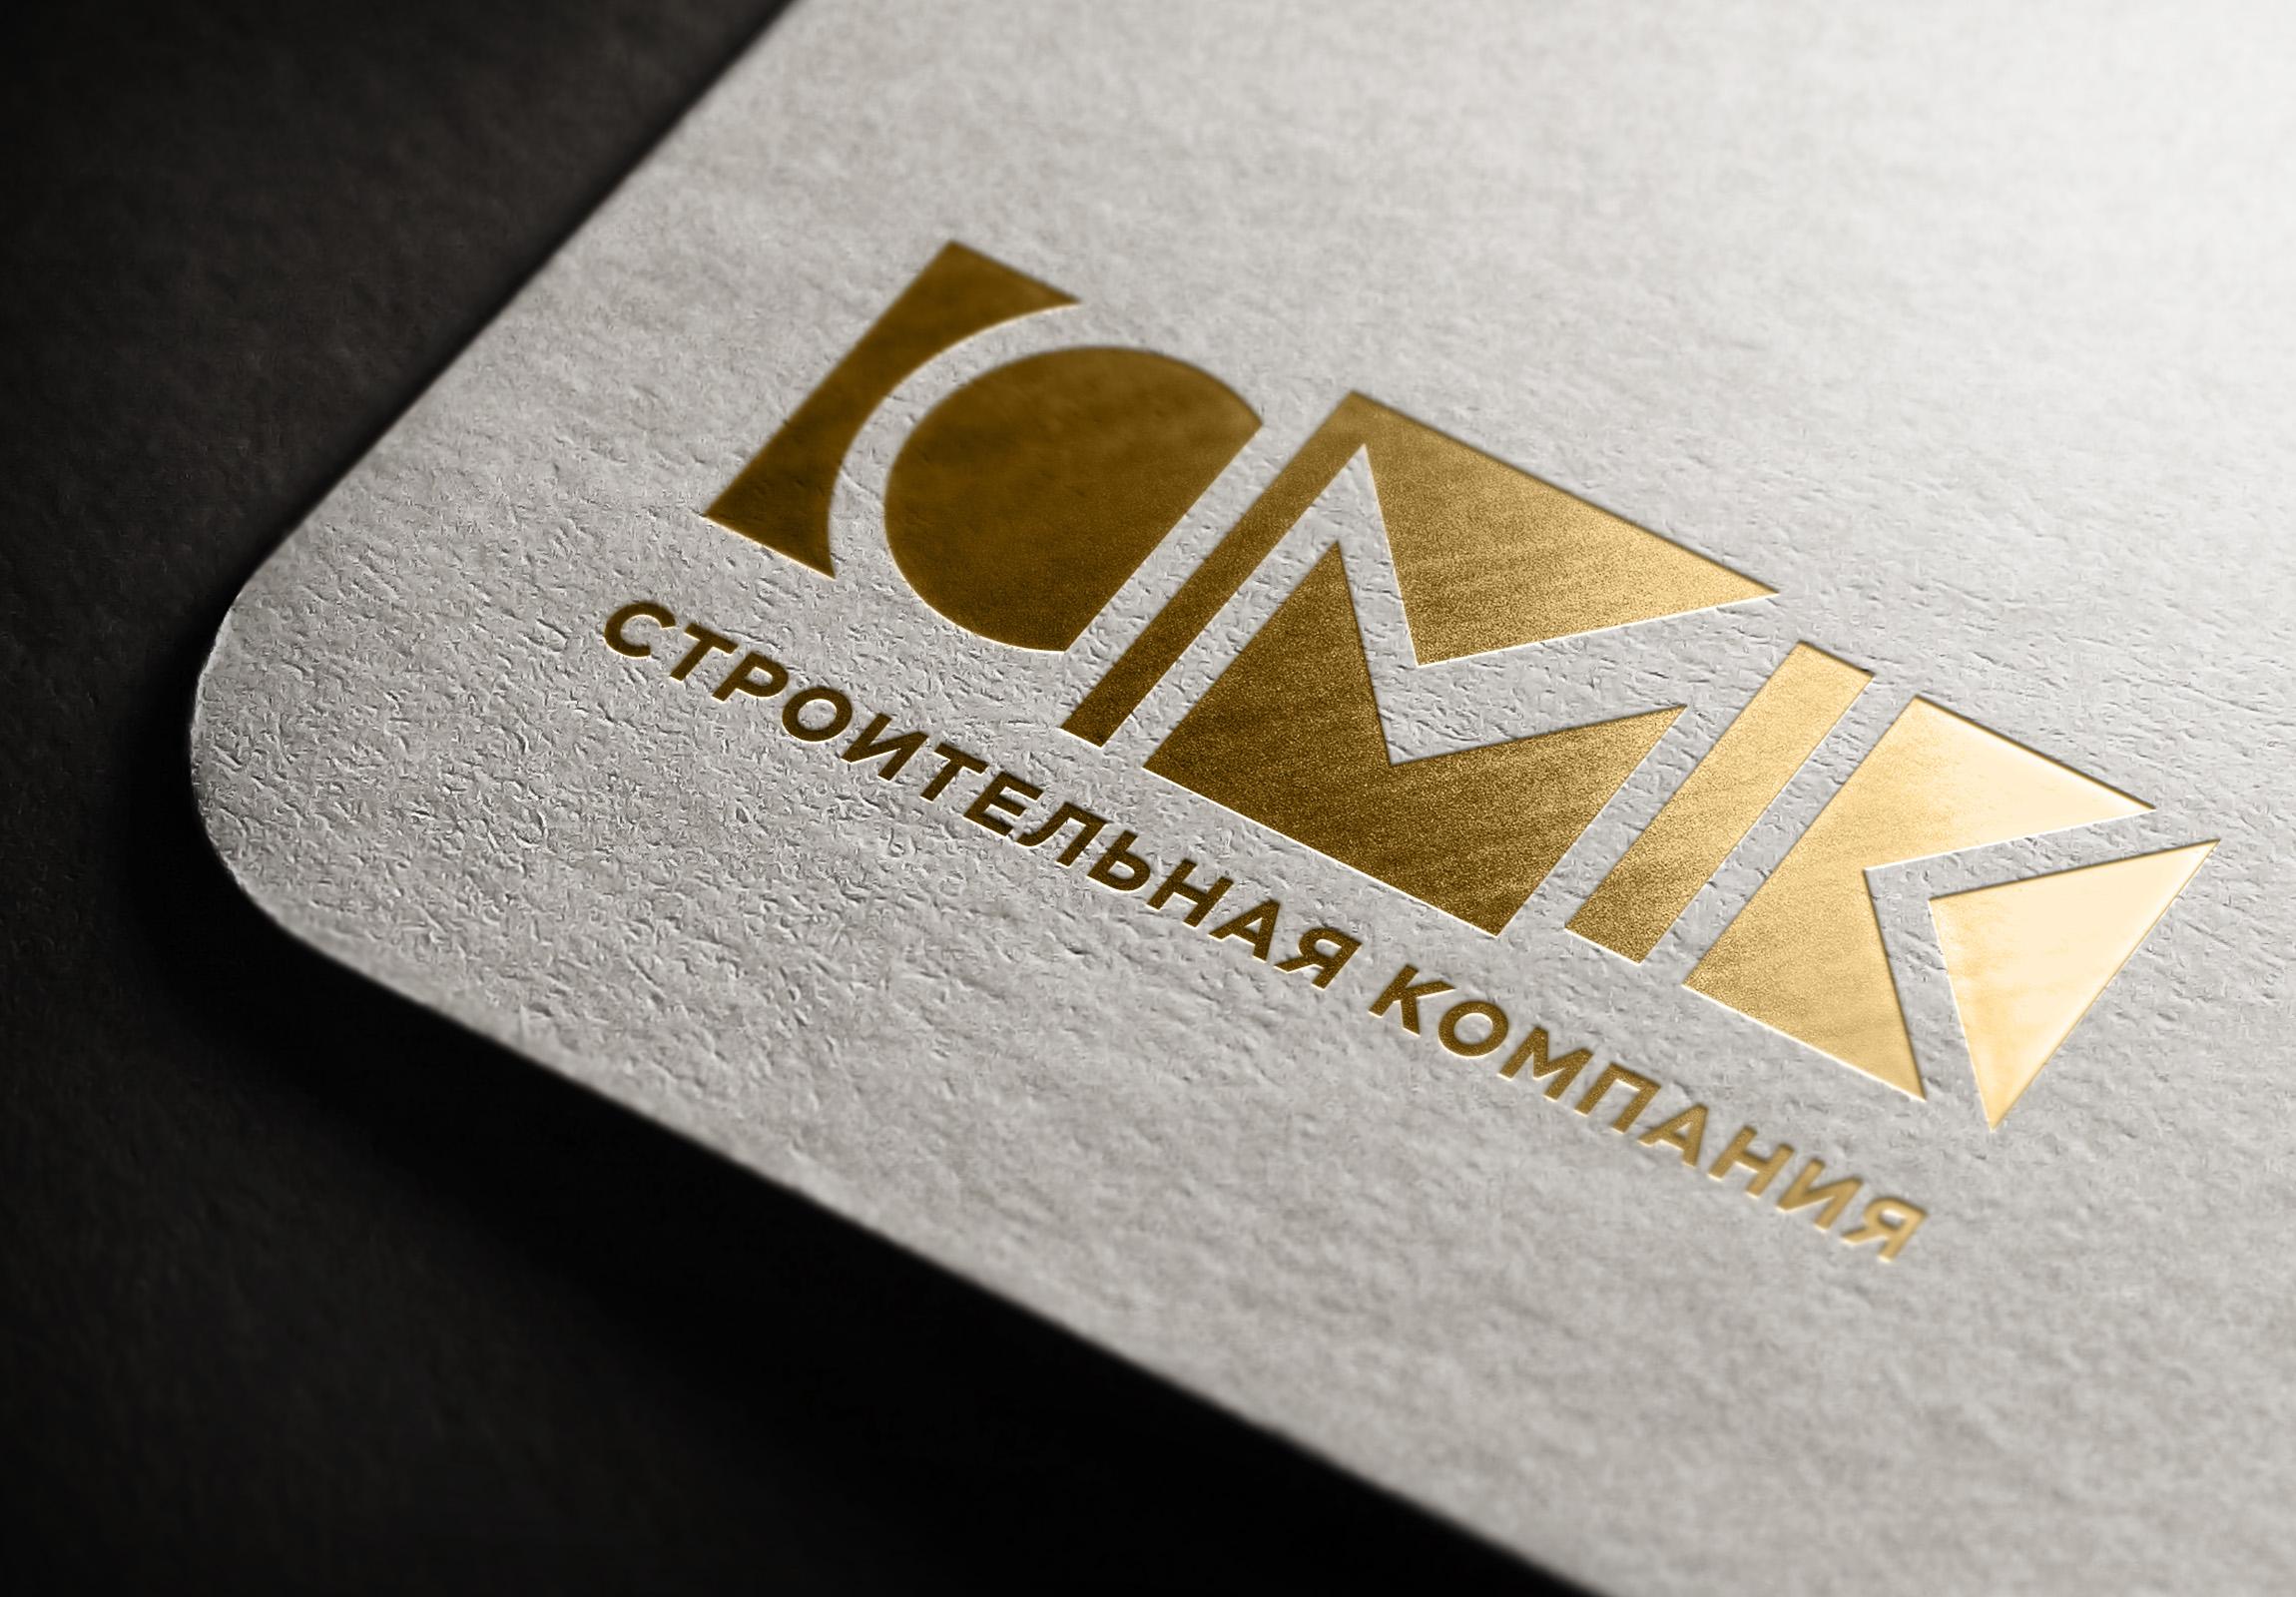 Разработка логотипа компании фото f_6865de3bceb0d4b3.jpg